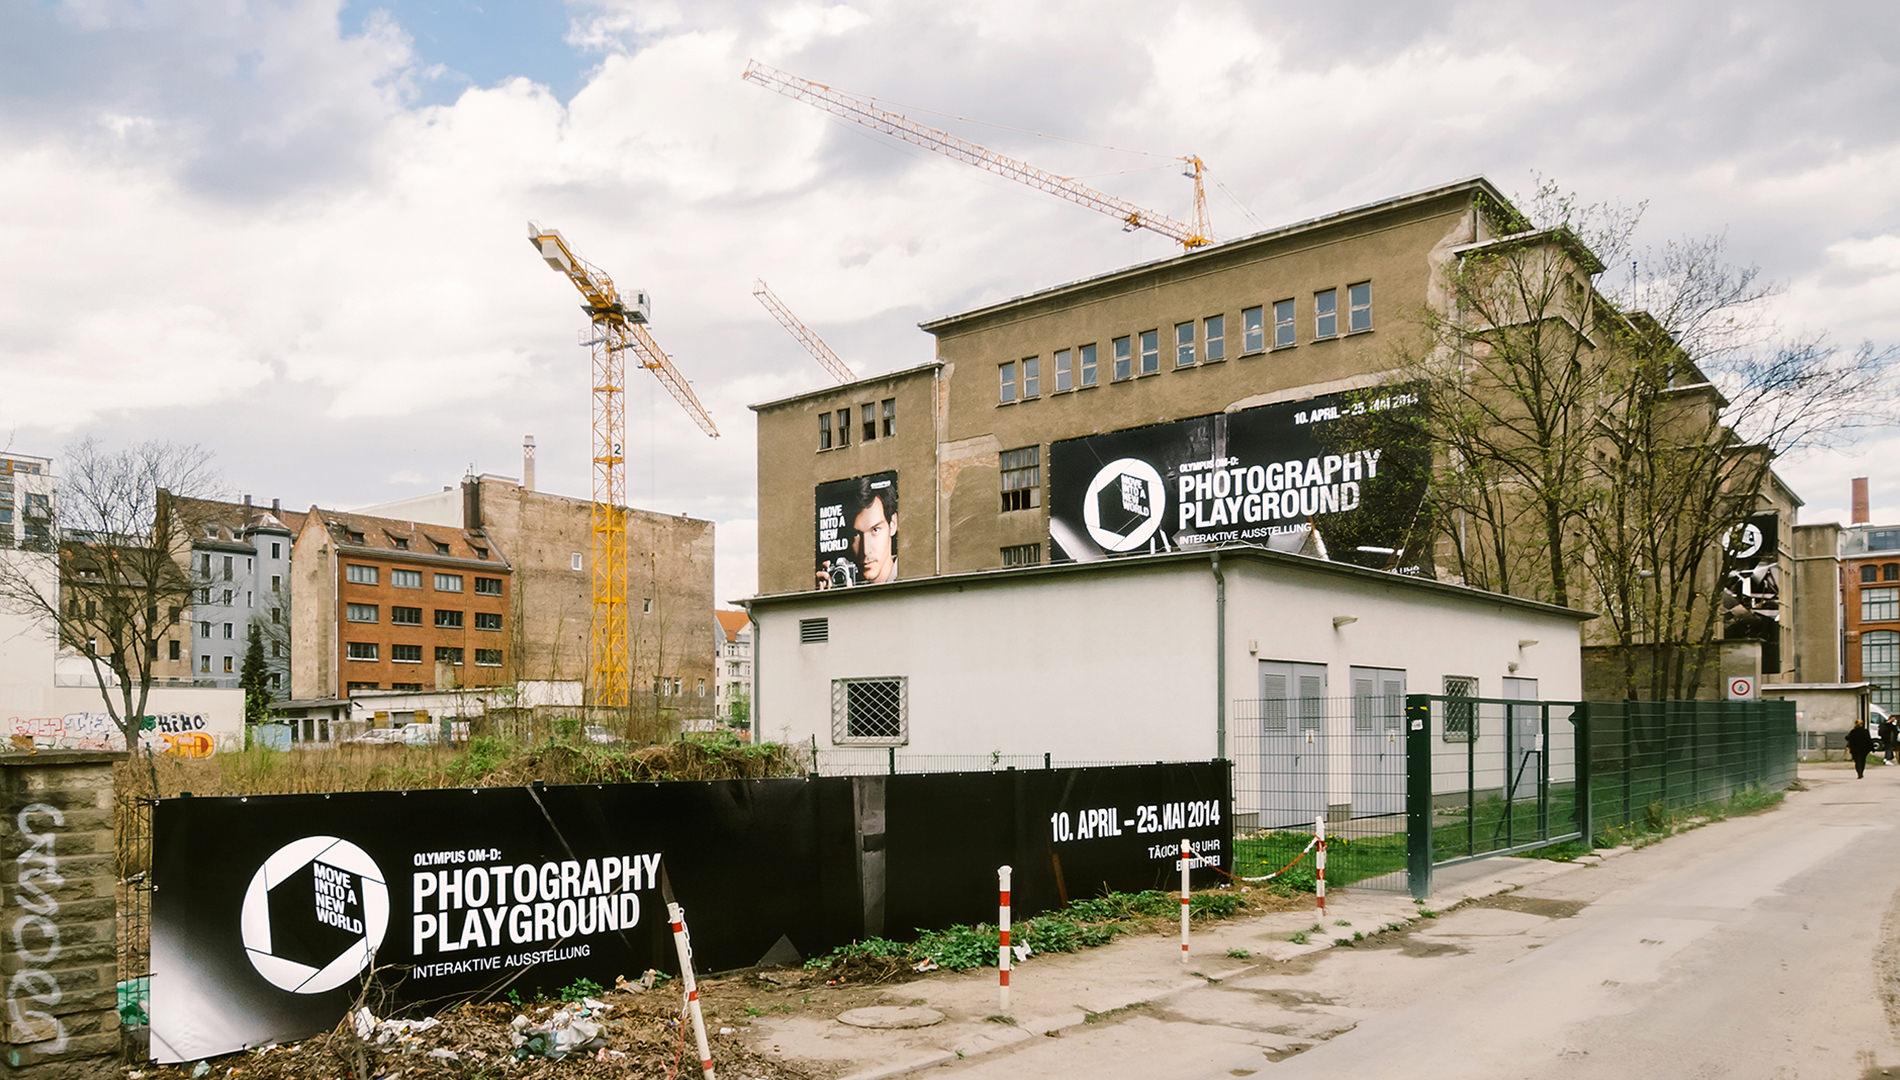 Messe Design Live Kommunikation Hamburg Berlin Köln Olympus Photography Playground Fassade Eingang Opernwerkstätten Going Places EventLabs